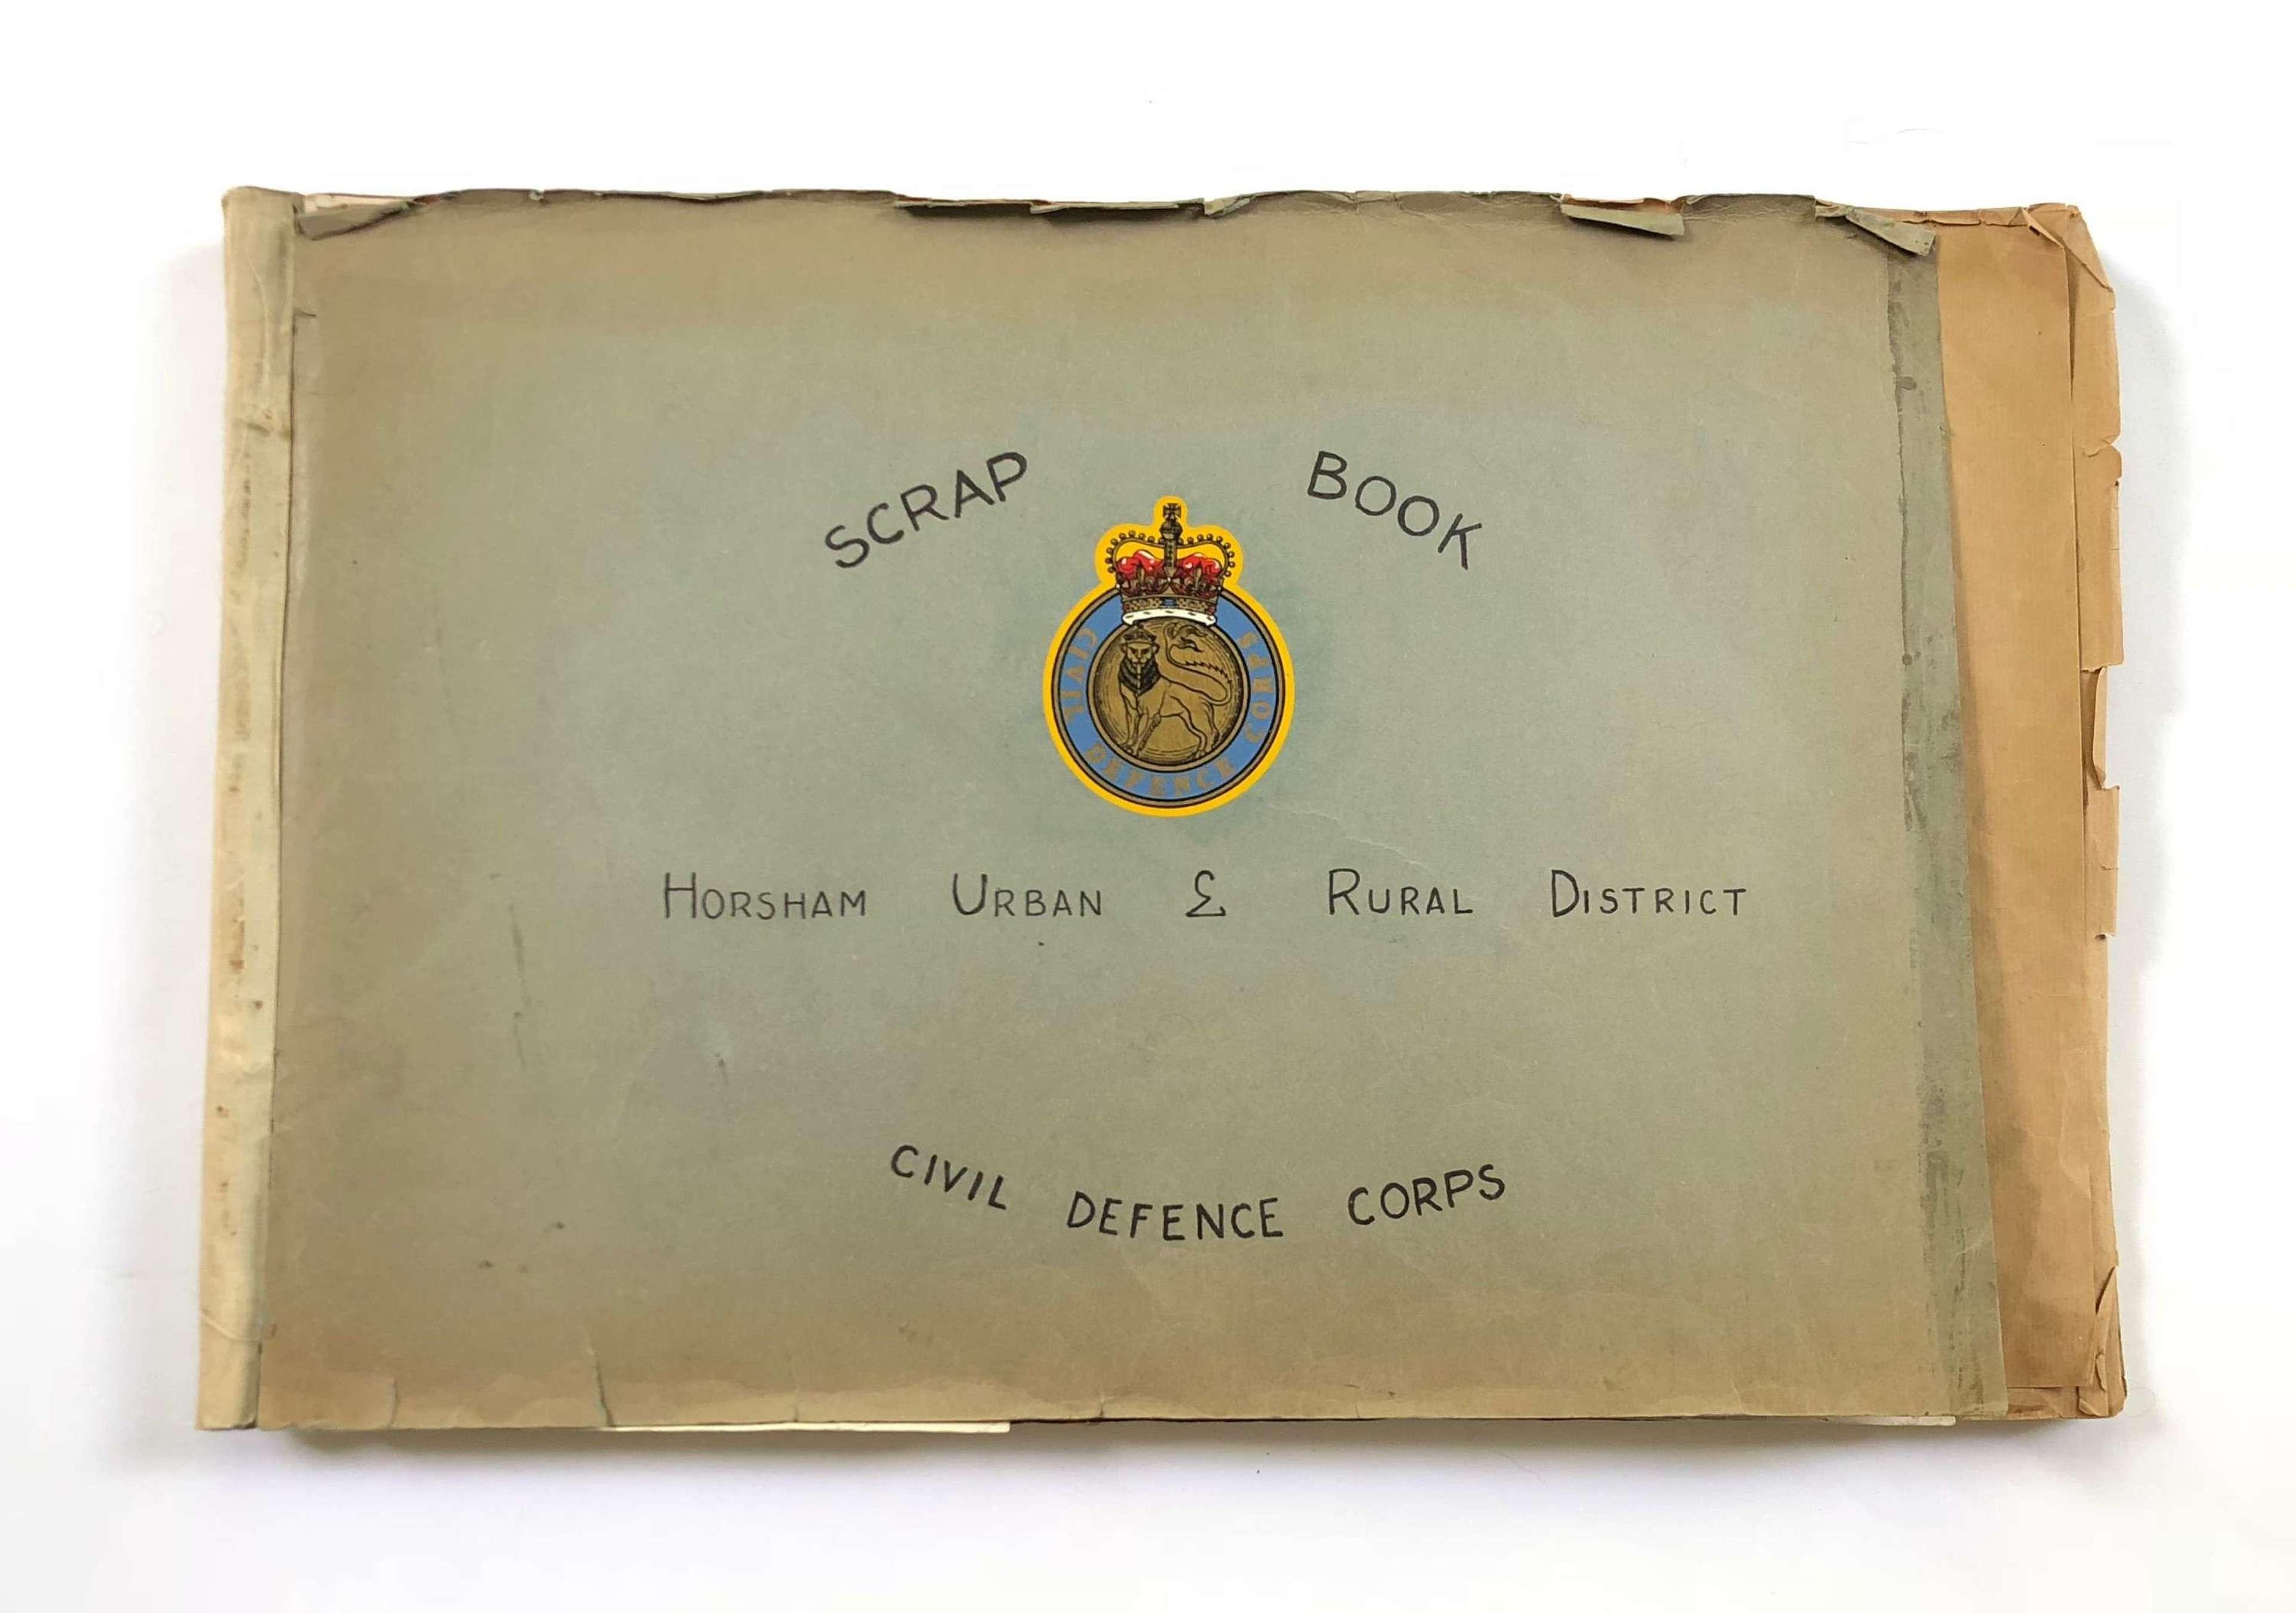 Cold War Period Civil Defence Horsham West Sussex Scrap Book.